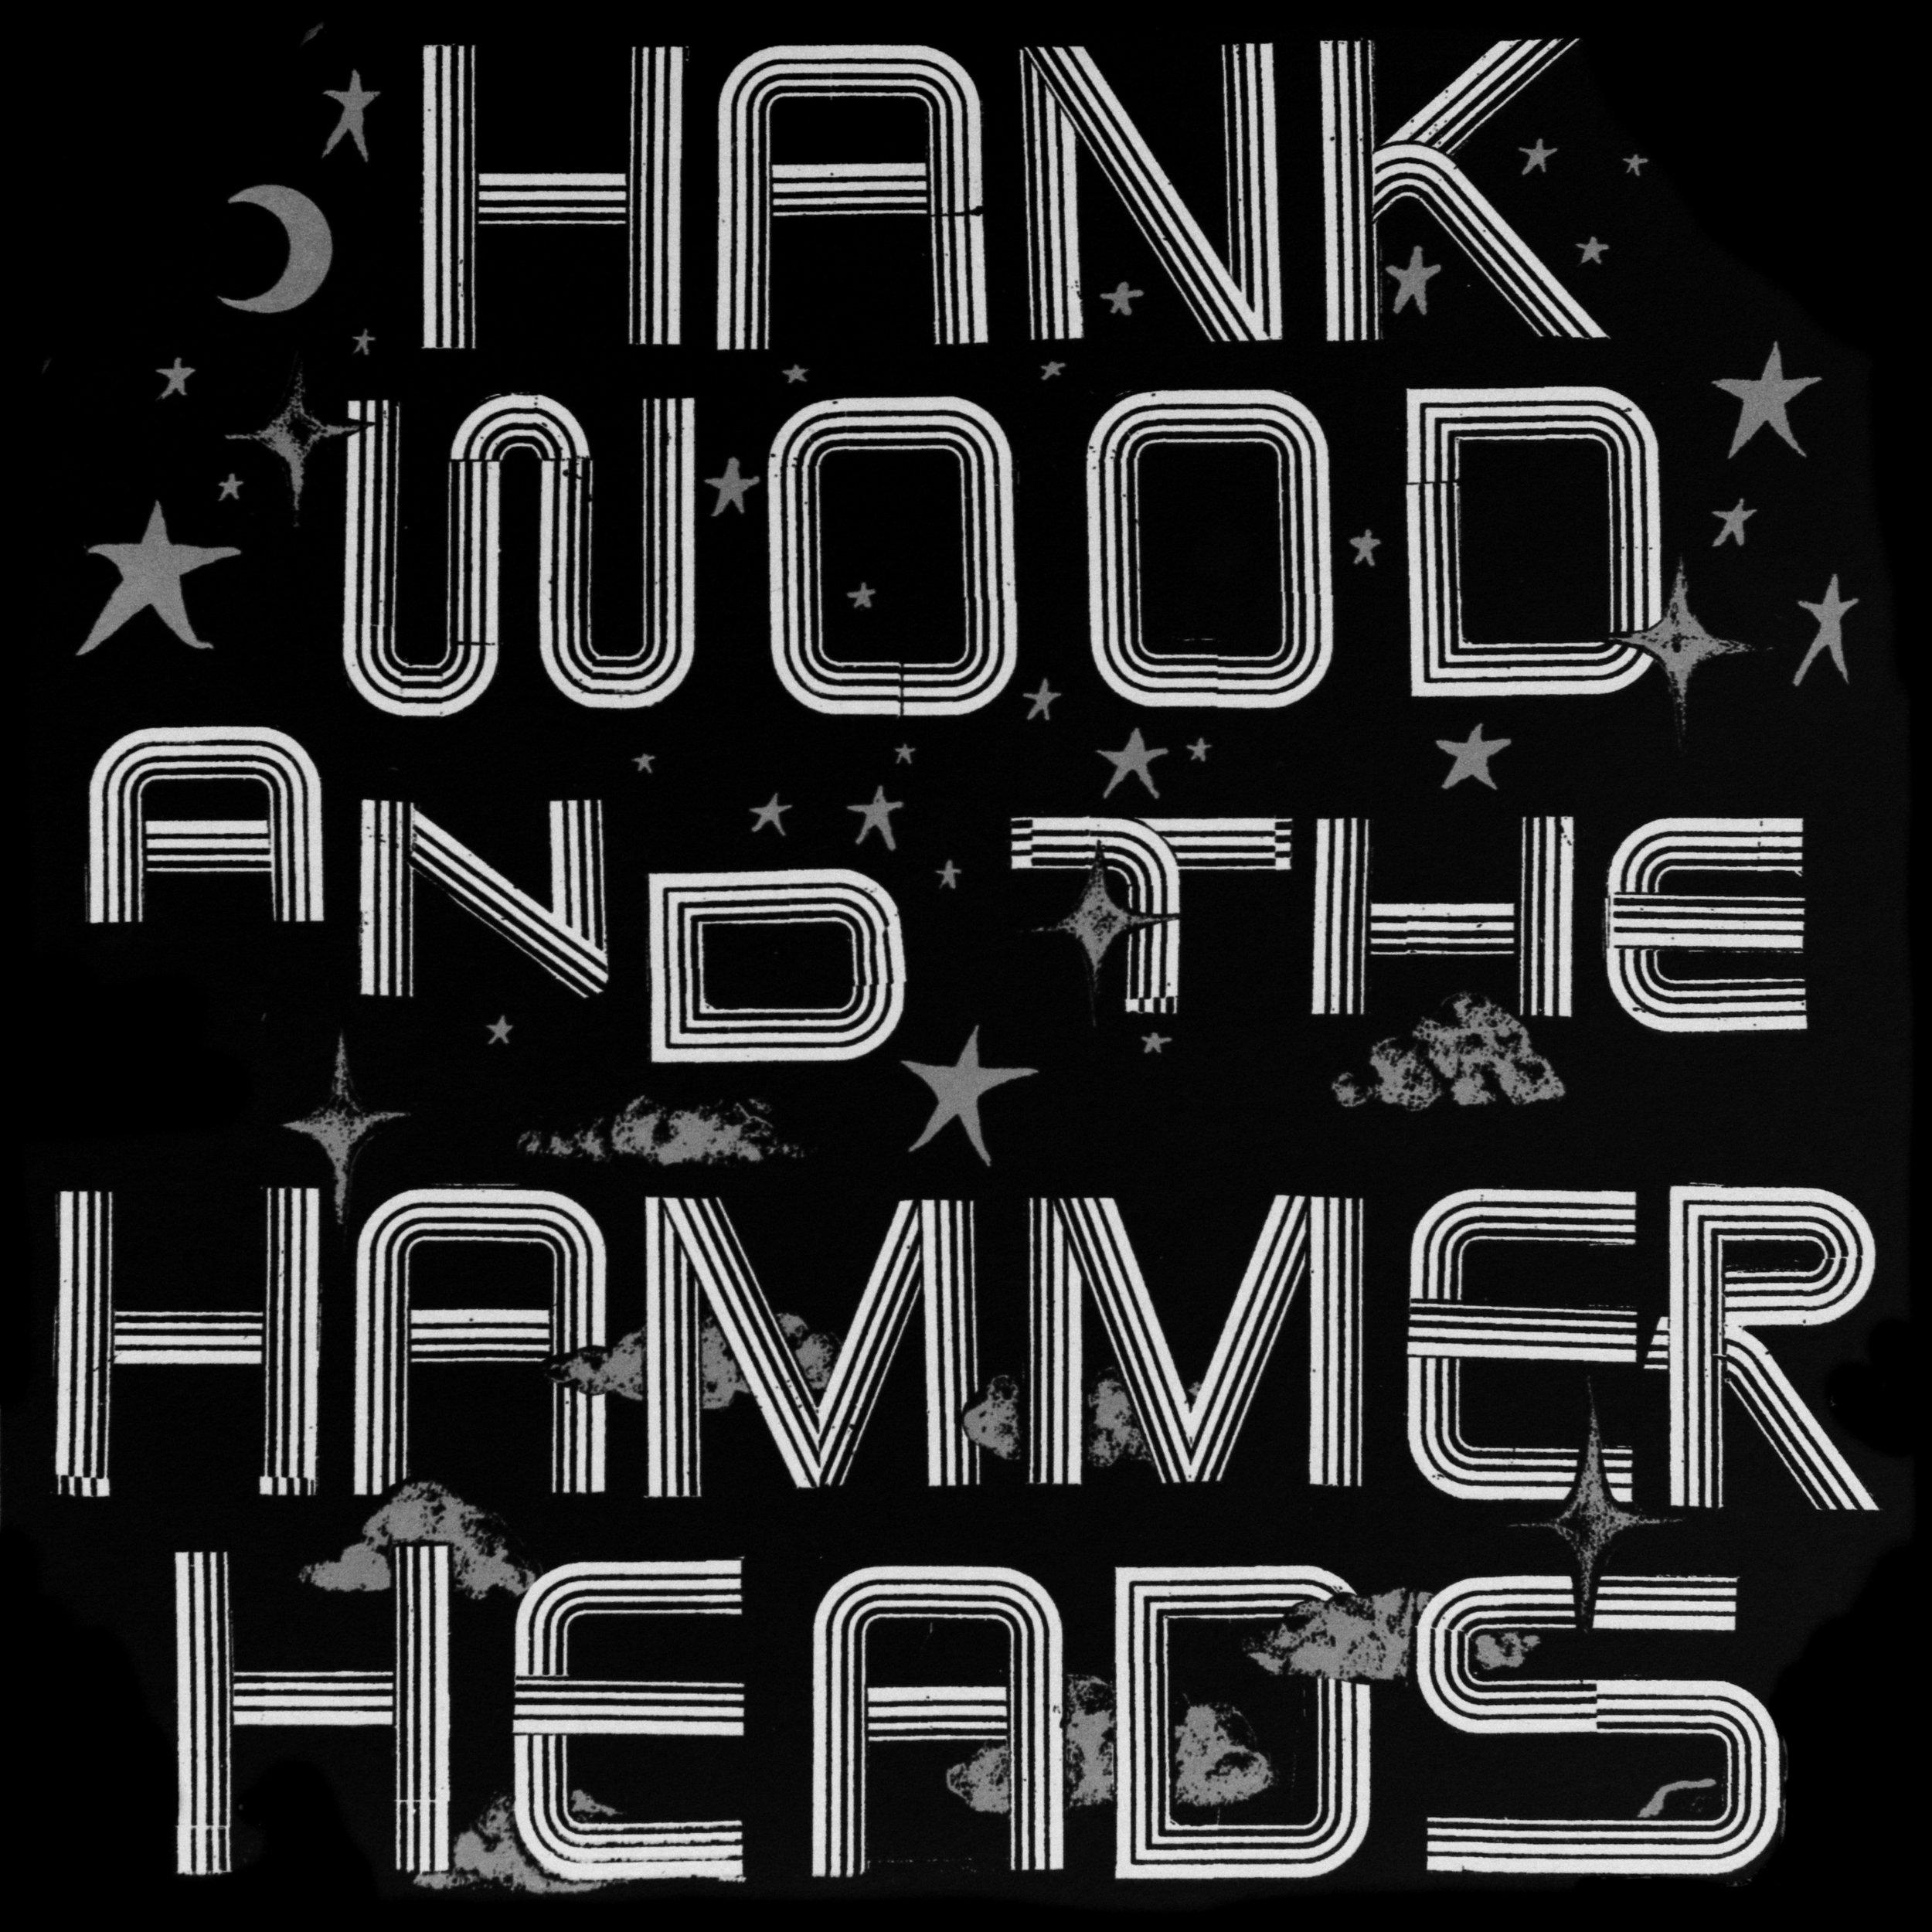 hankwood_logo.jpg